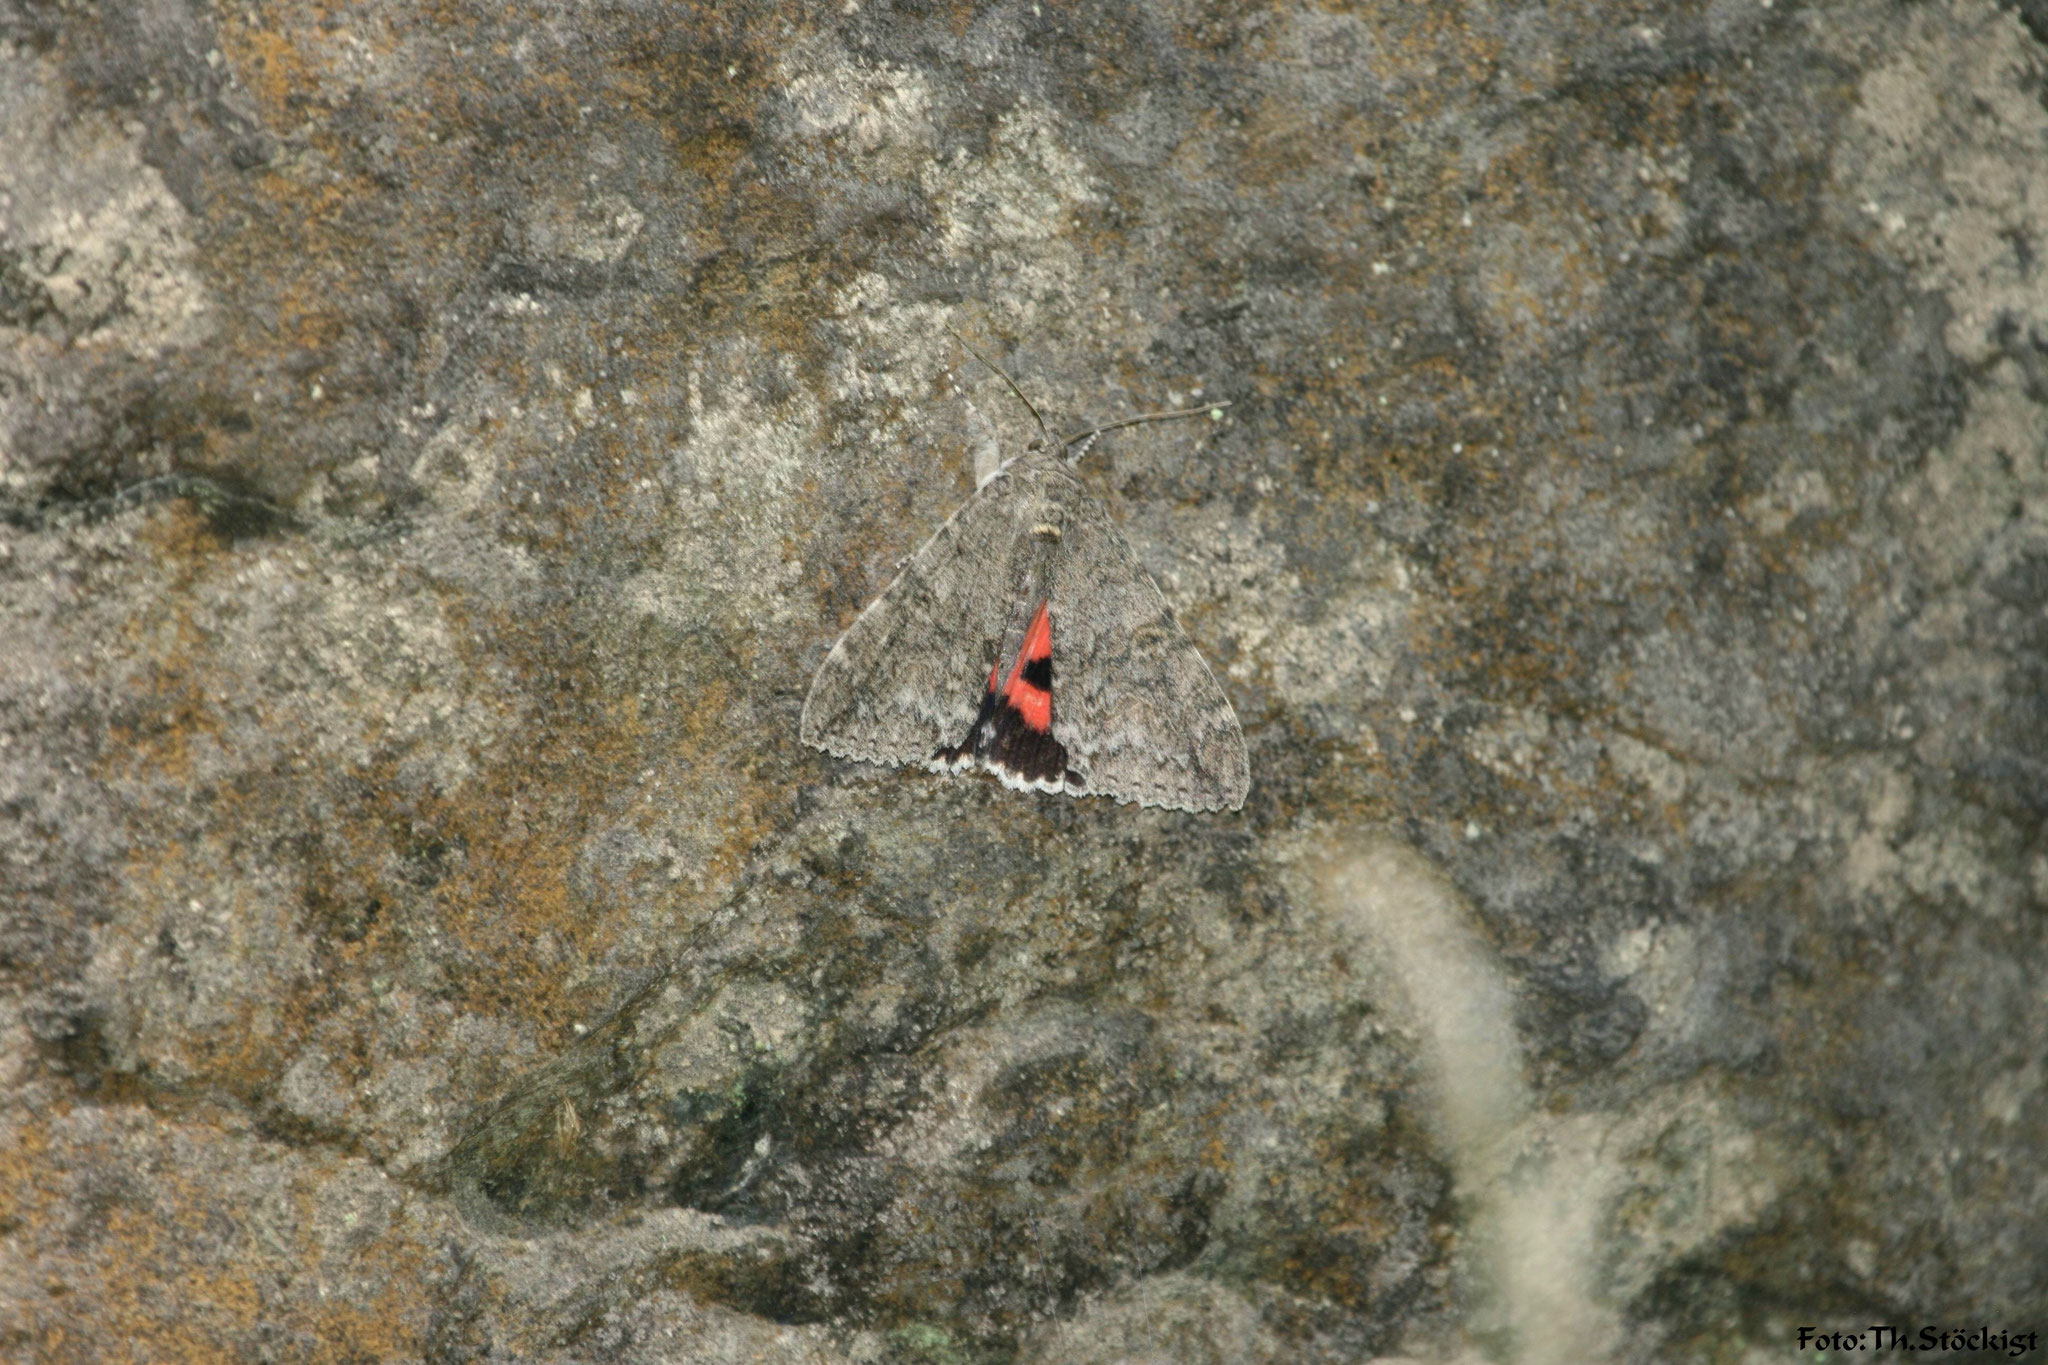 Rotes Ordensband Catocala nupta